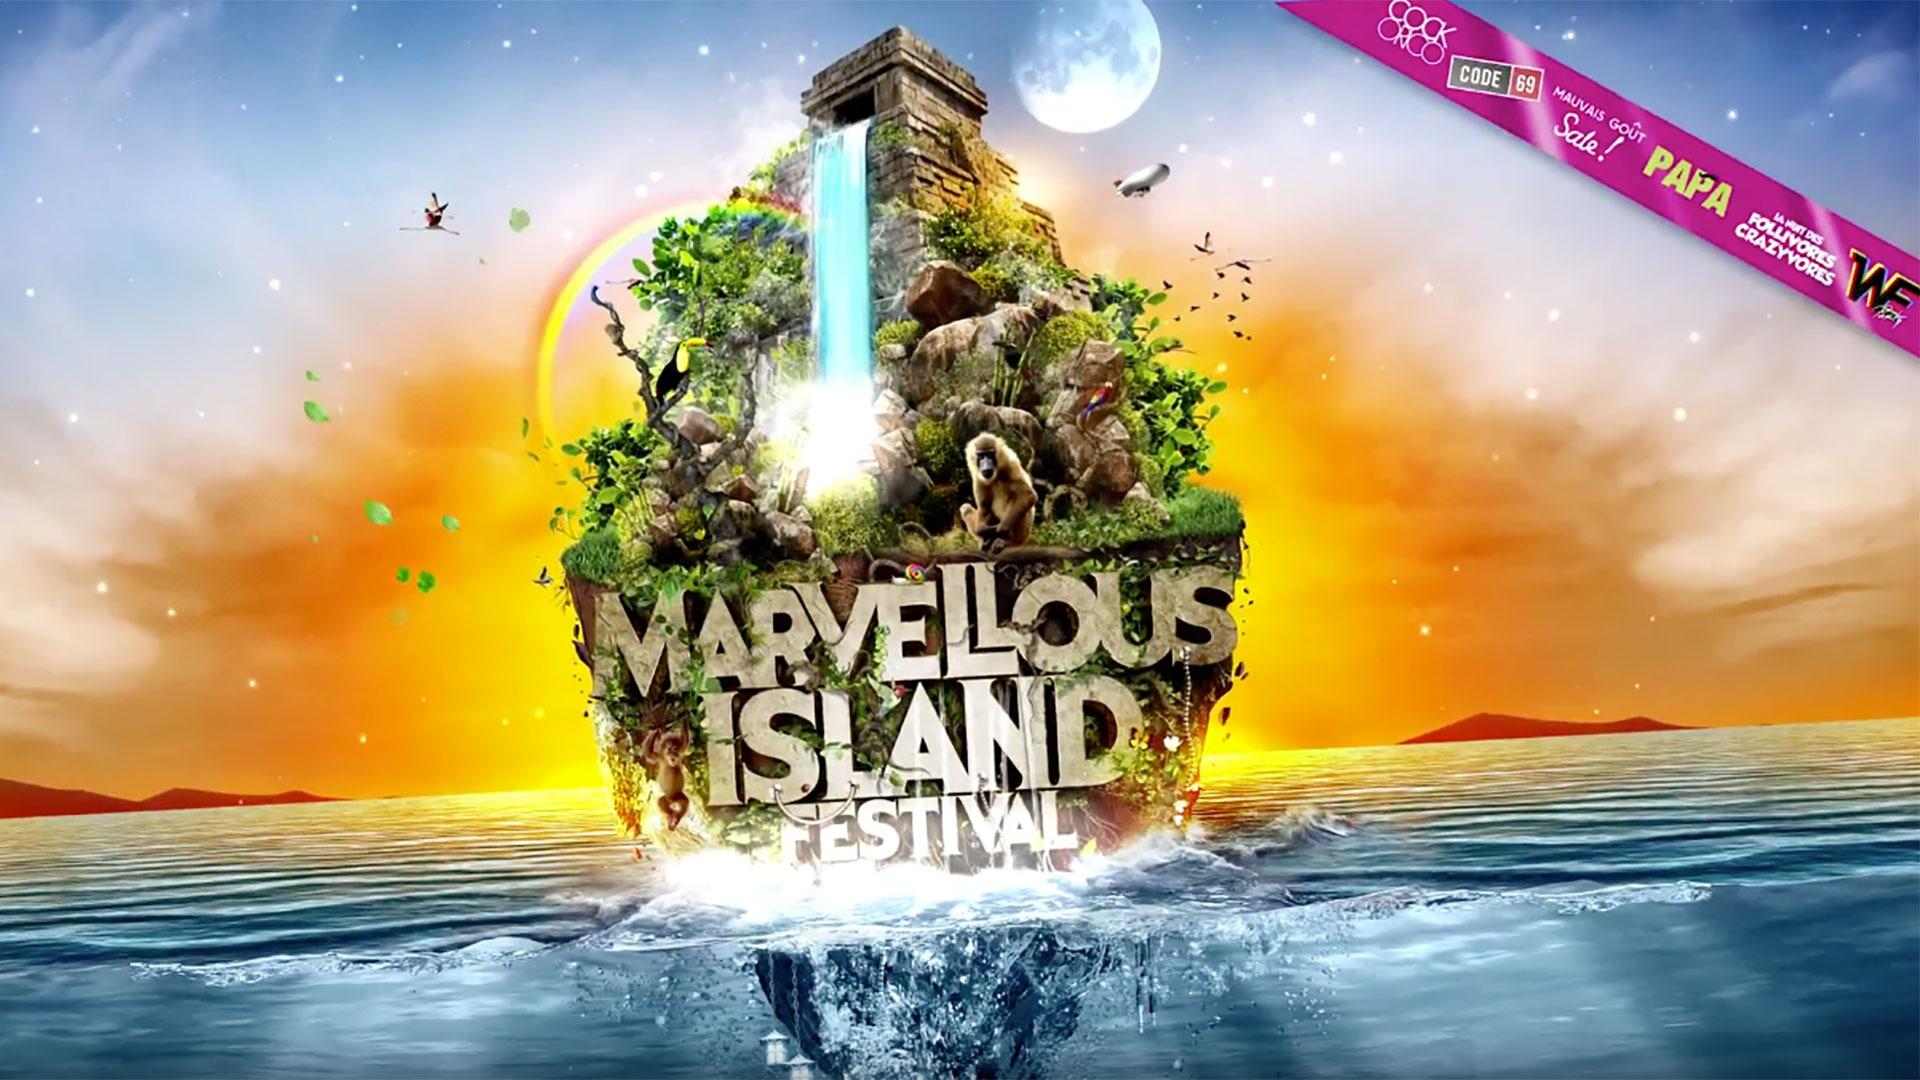 MARVELLOUS ISLAND FESTIVAL